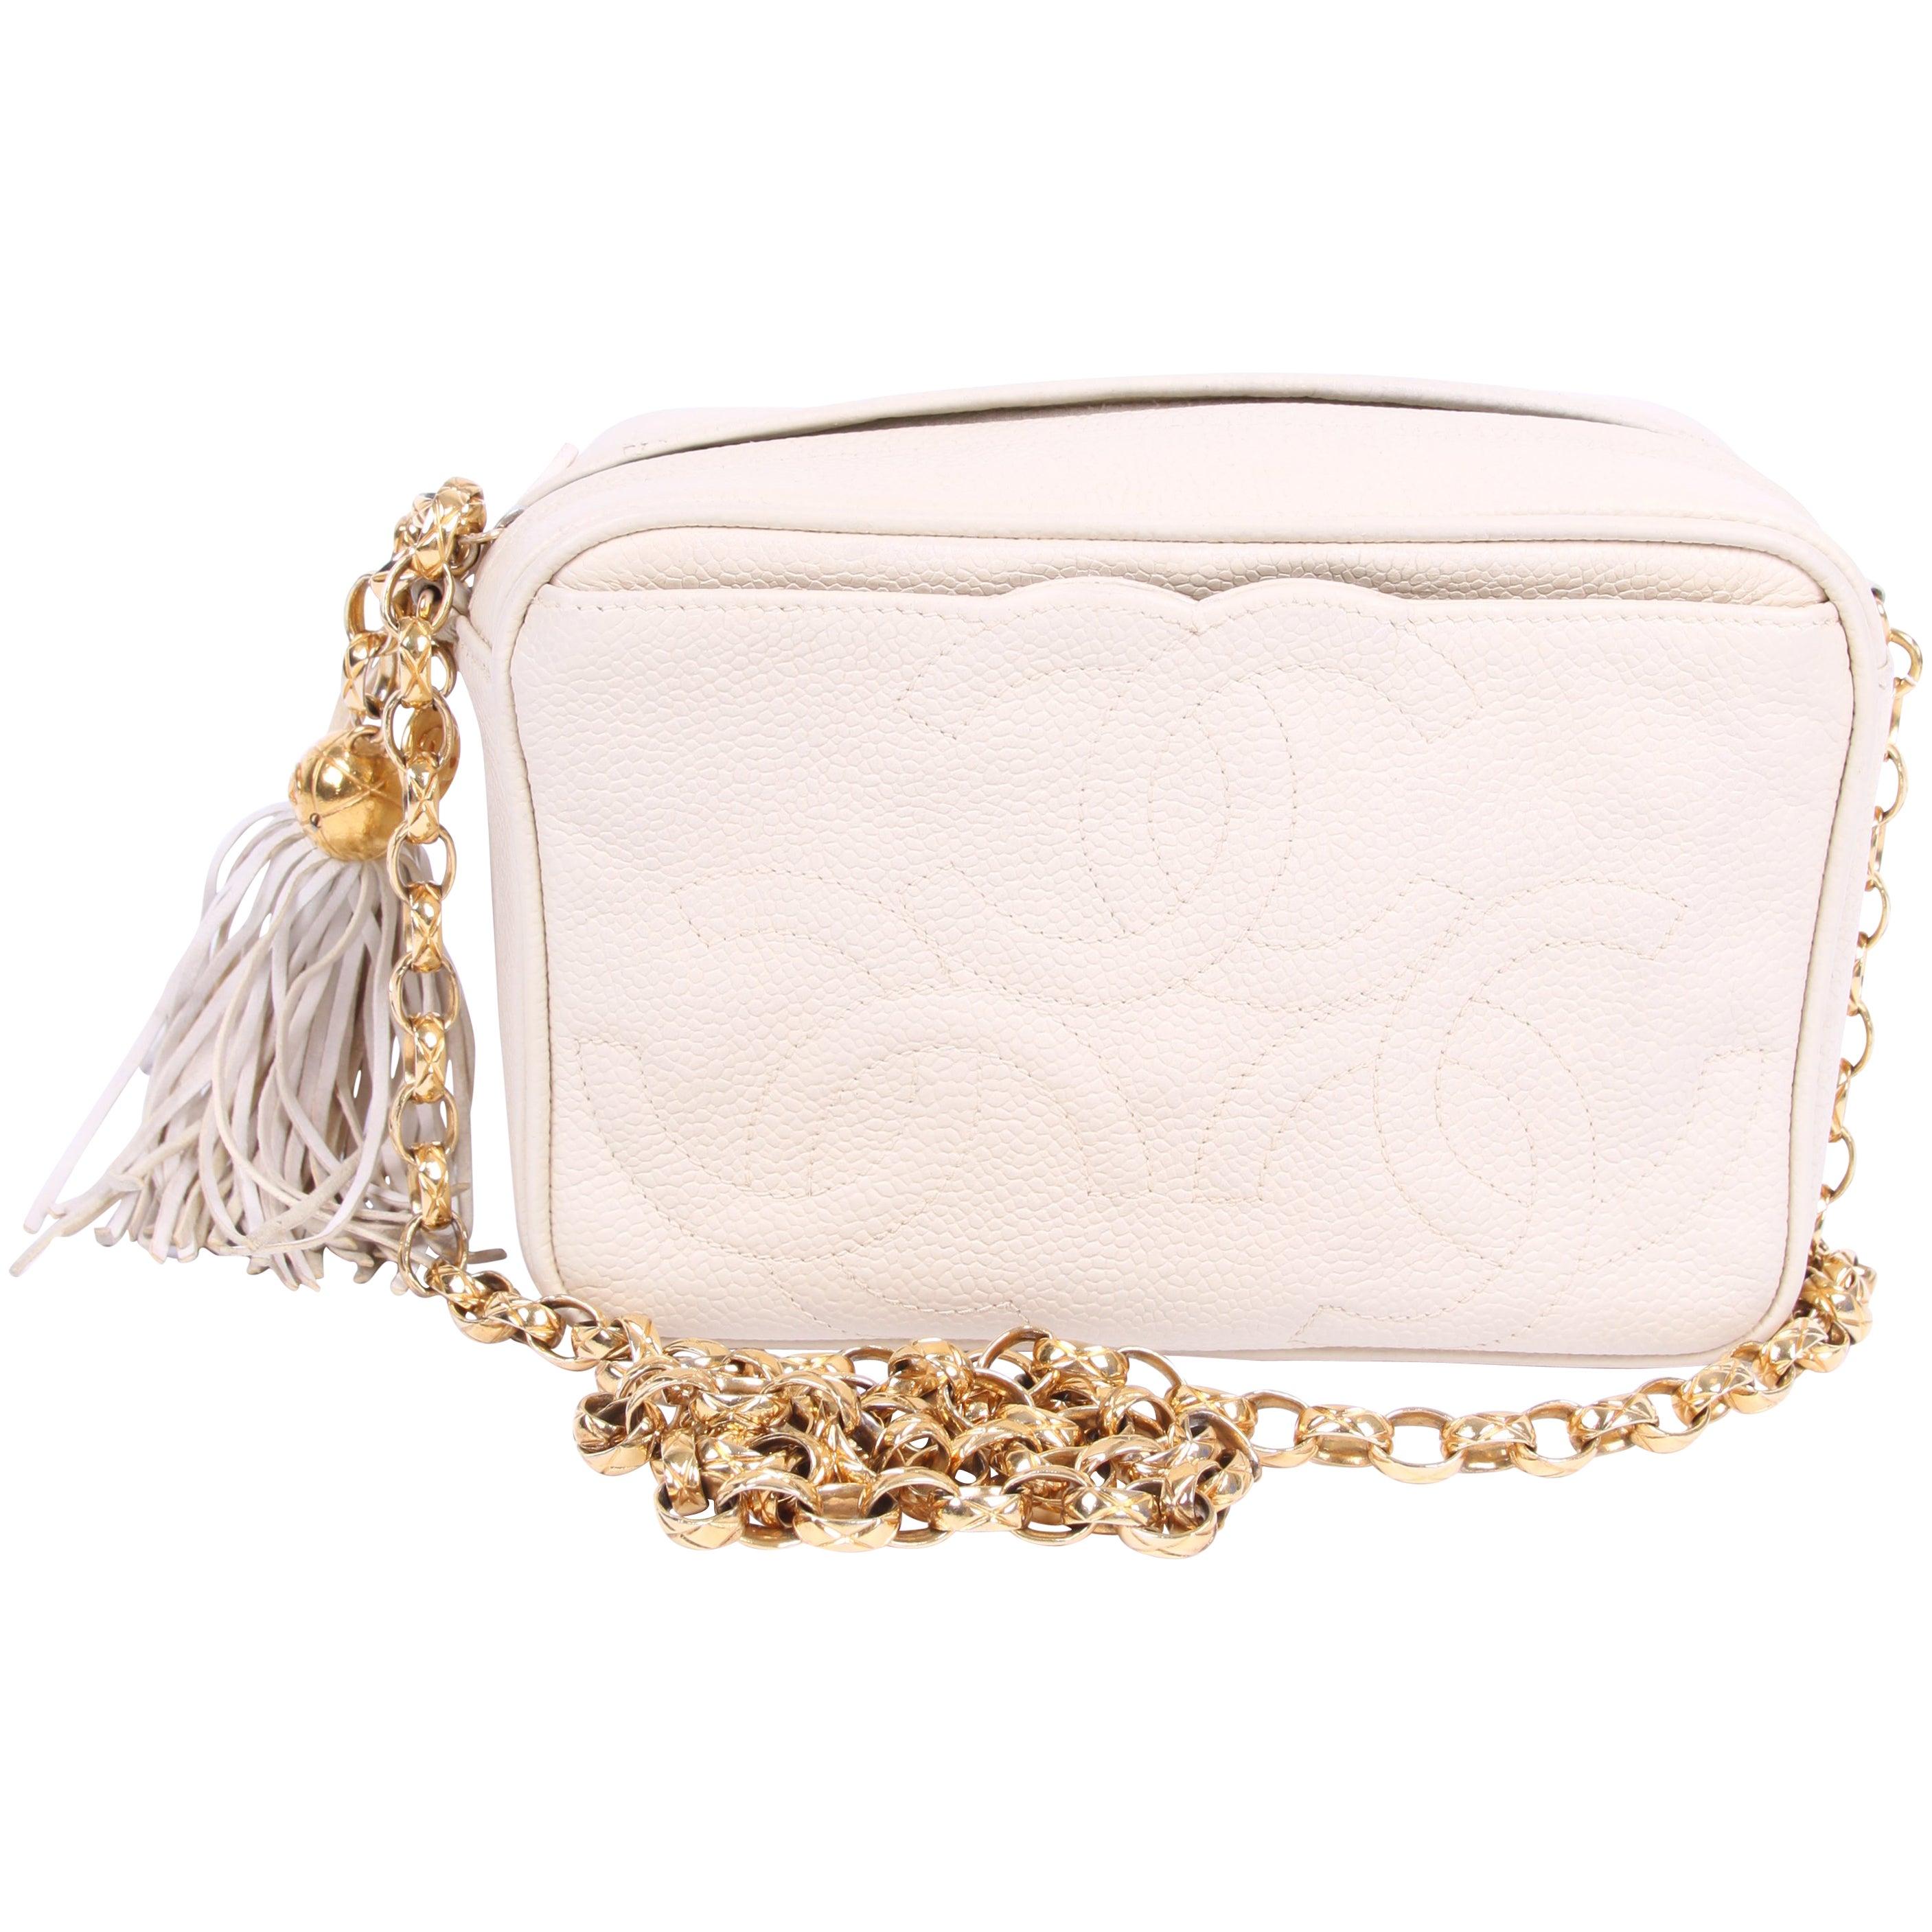 5e693366c67c 1995/1996 Vintage Chanel Camera Bag - ivory leather For Sale at 1stdibs